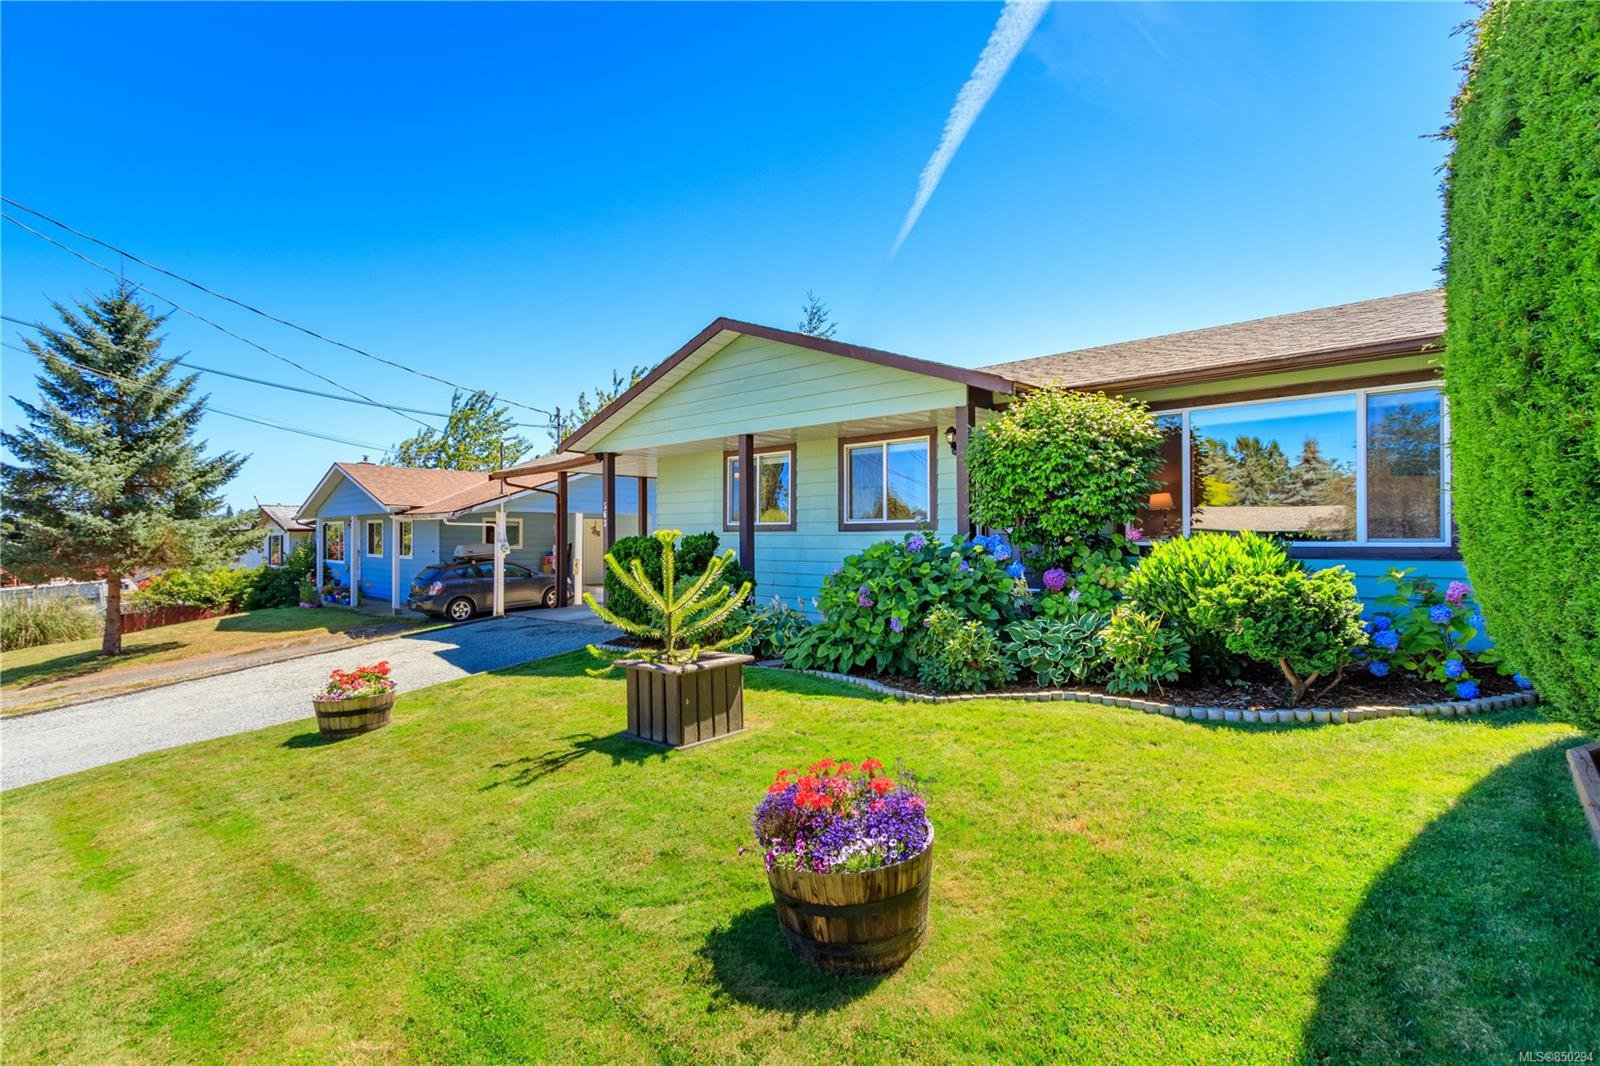 Main Photo: 563 Nova St in : Na South Nanaimo Single Family Detached for sale (Nanaimo)  : MLS®# 850294